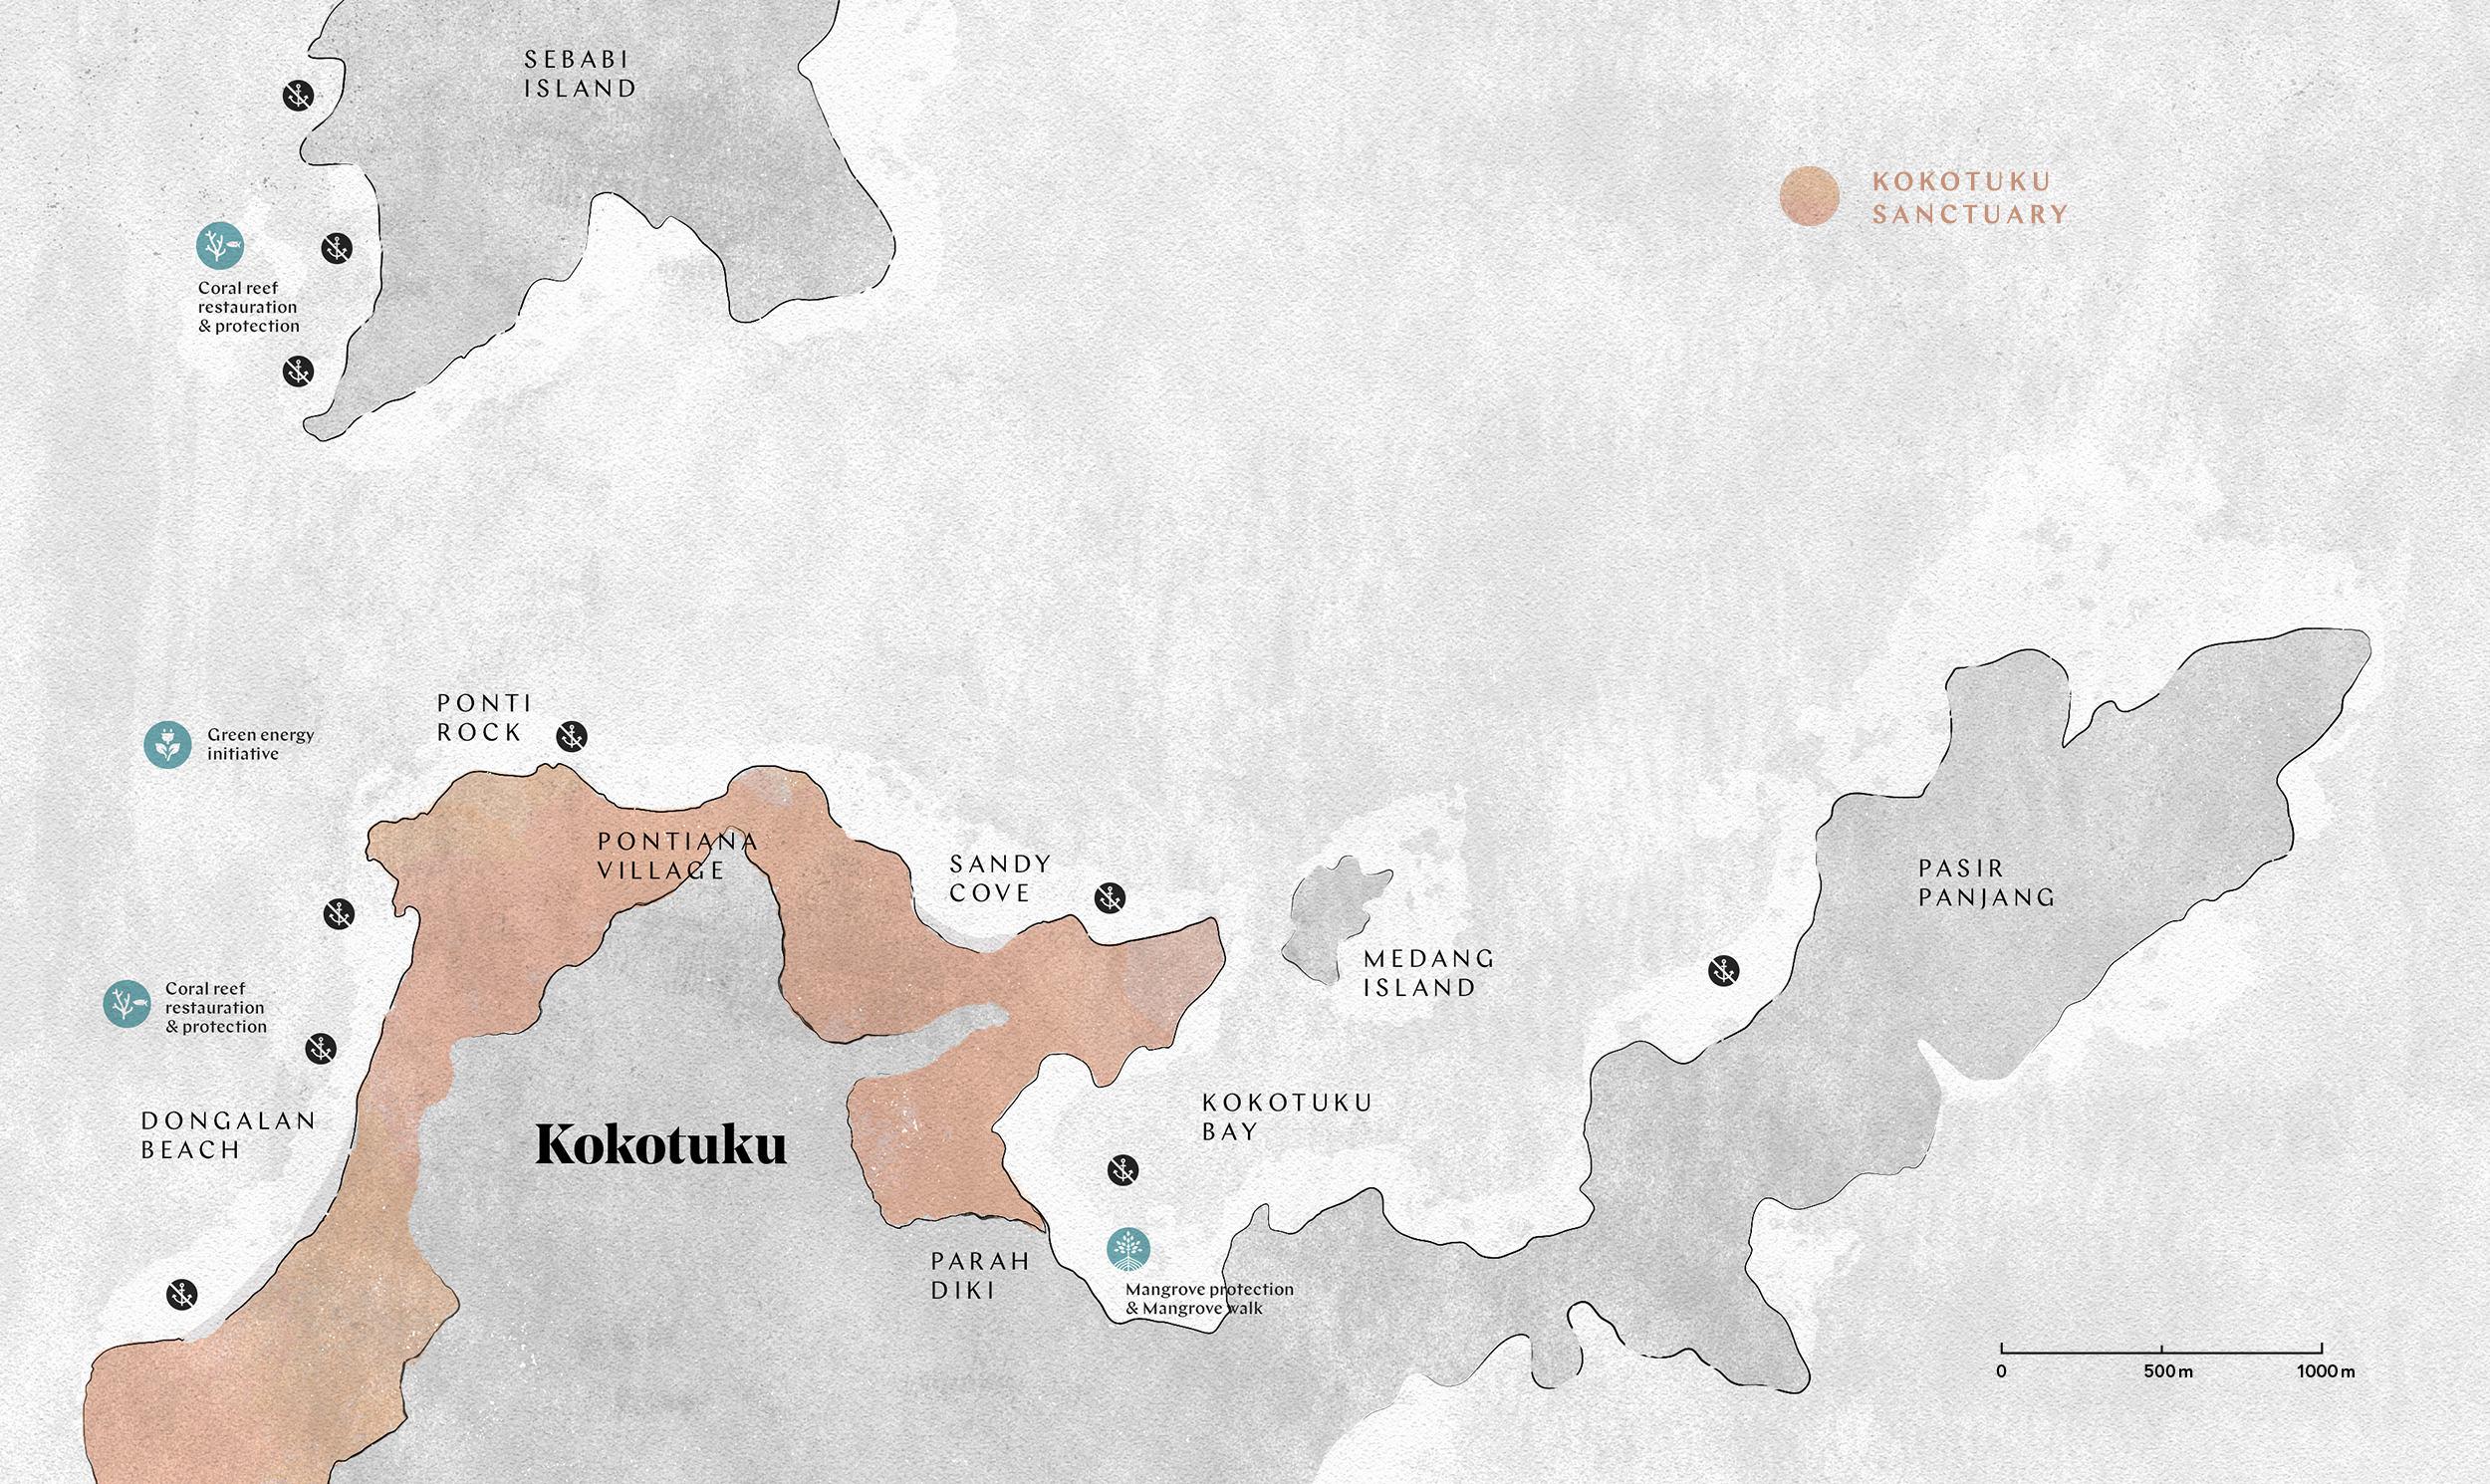 KOKOTUKU_sanctuary_scale.jpg